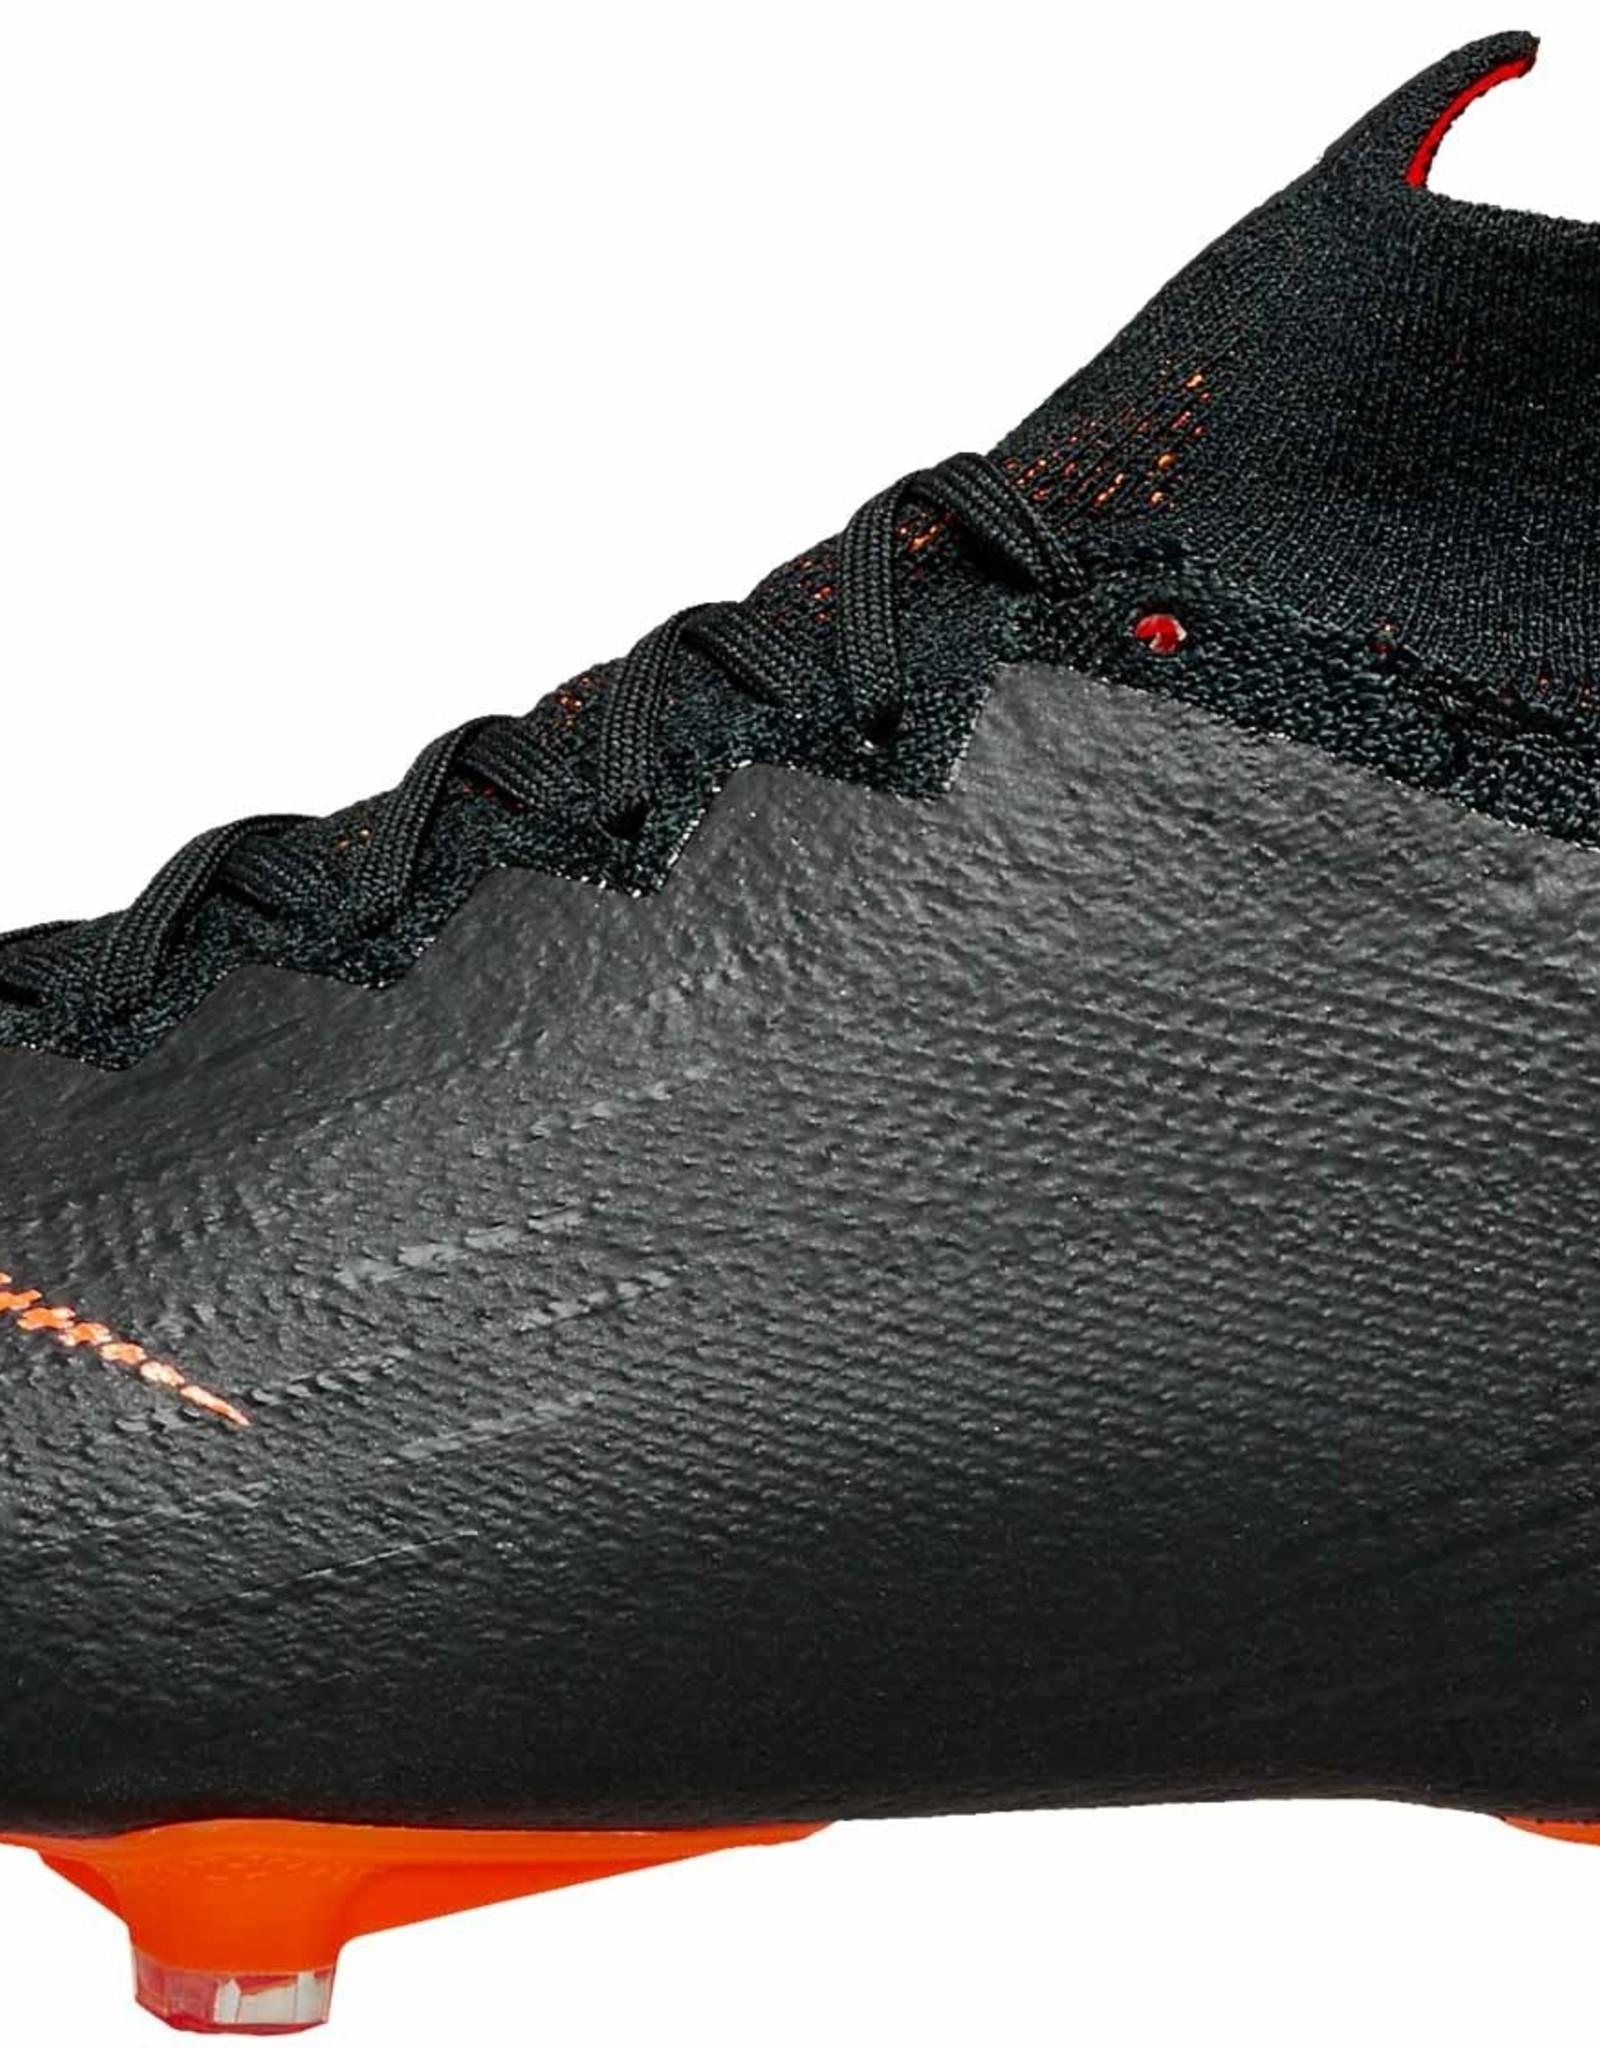 Nike Nike JR Superfly 6 Elite (Mercurial) FG